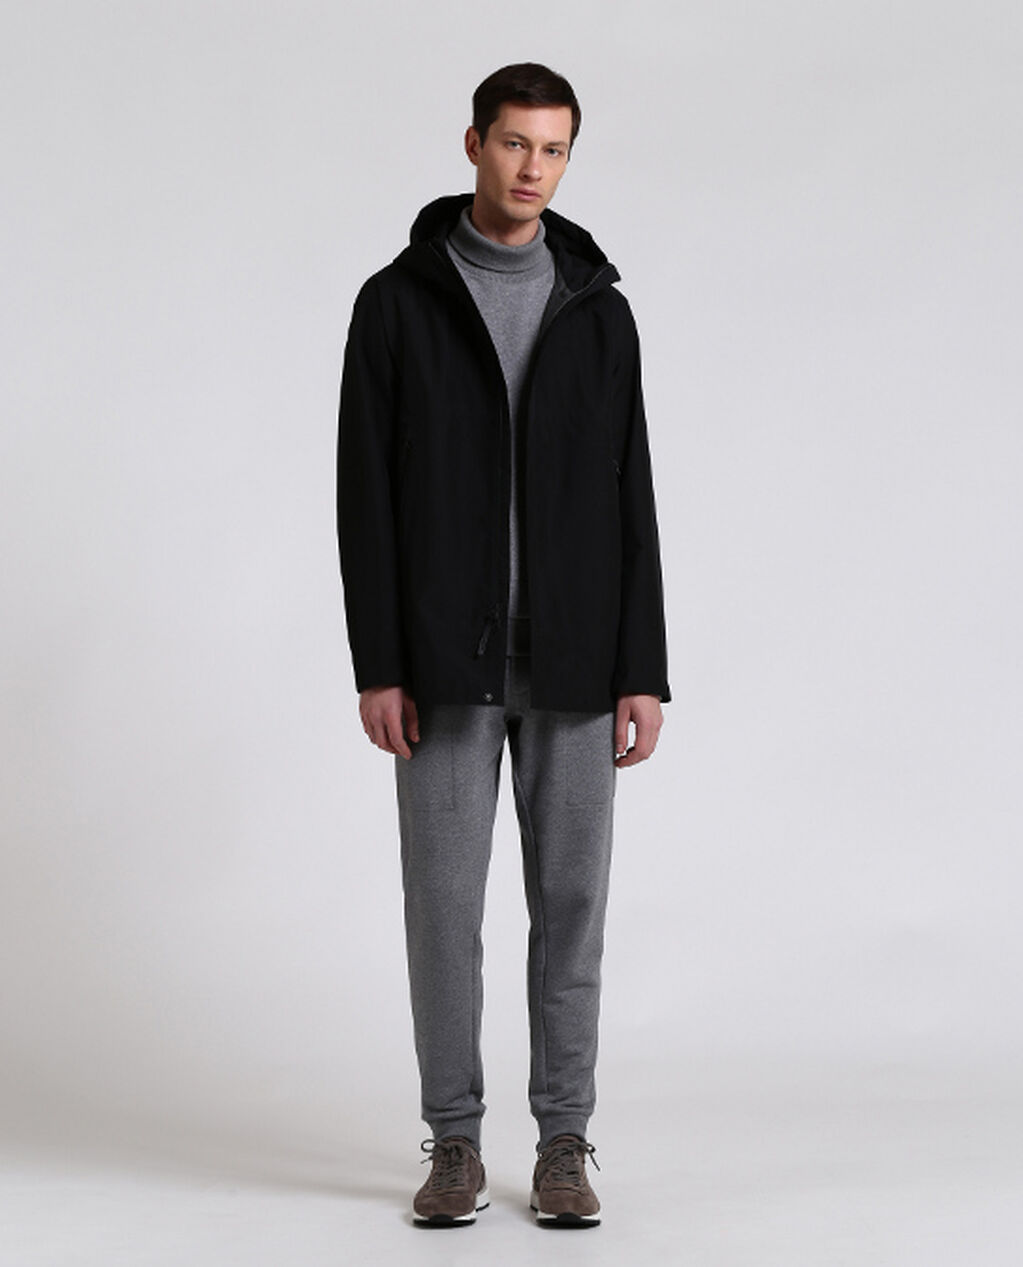 Gtx Atlantic Coat Look